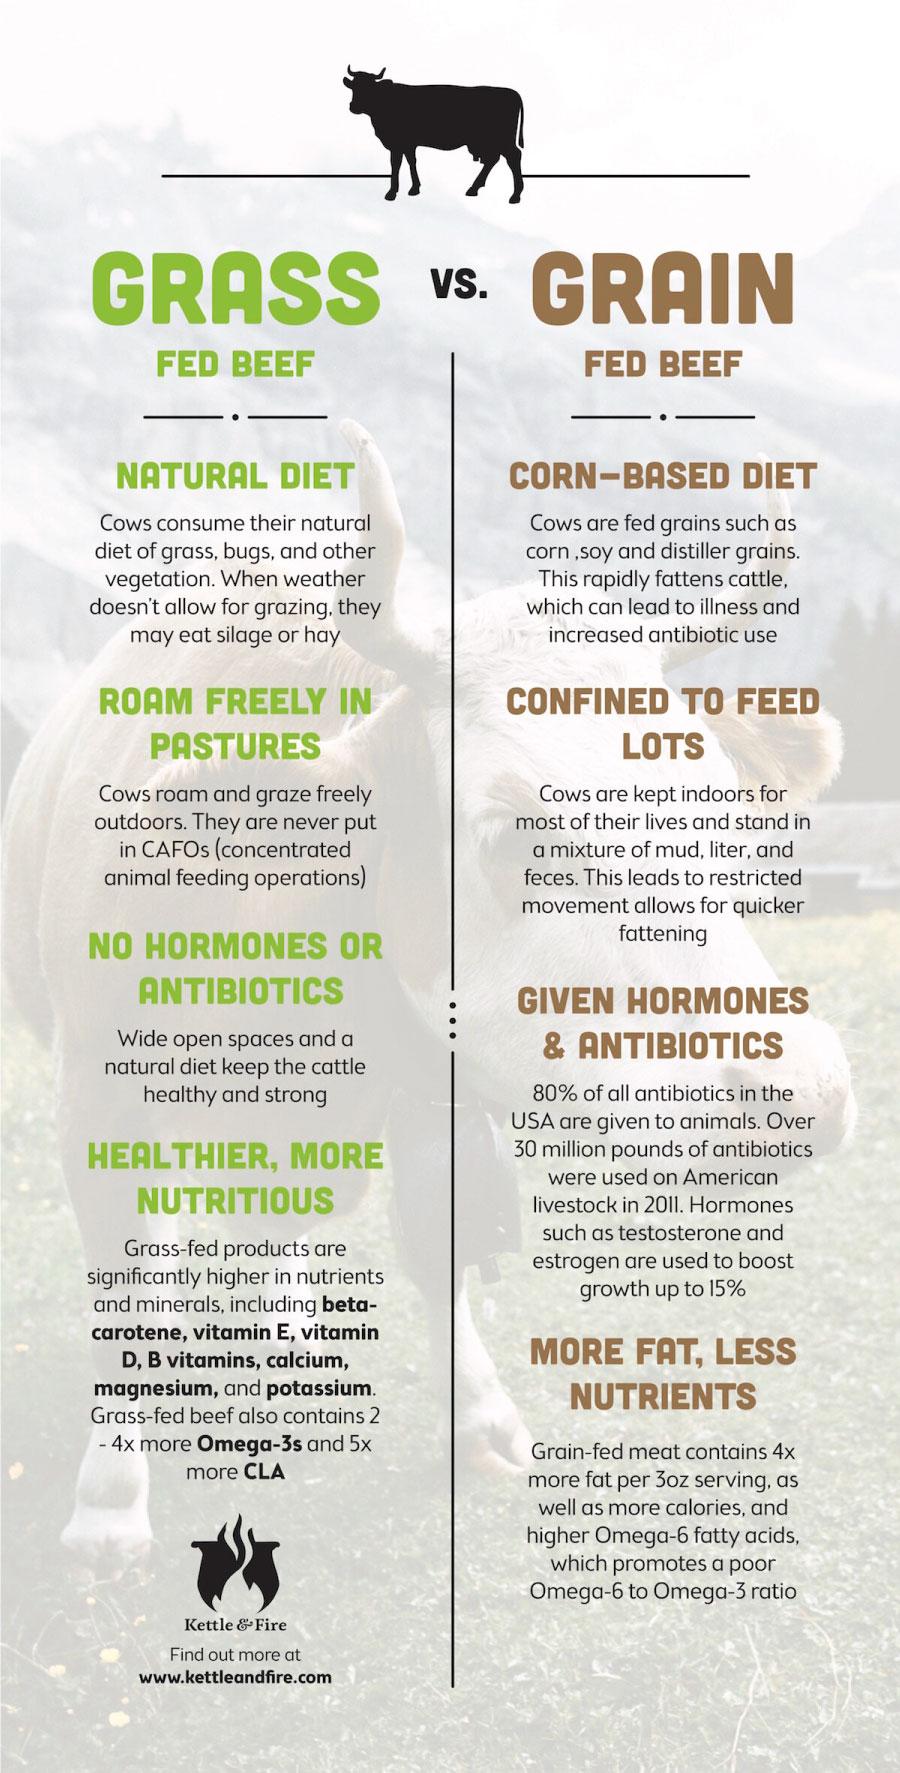 Good-Hope-Cattle-Grass-Fed-Beef-vs-Grain-Fed-Beef